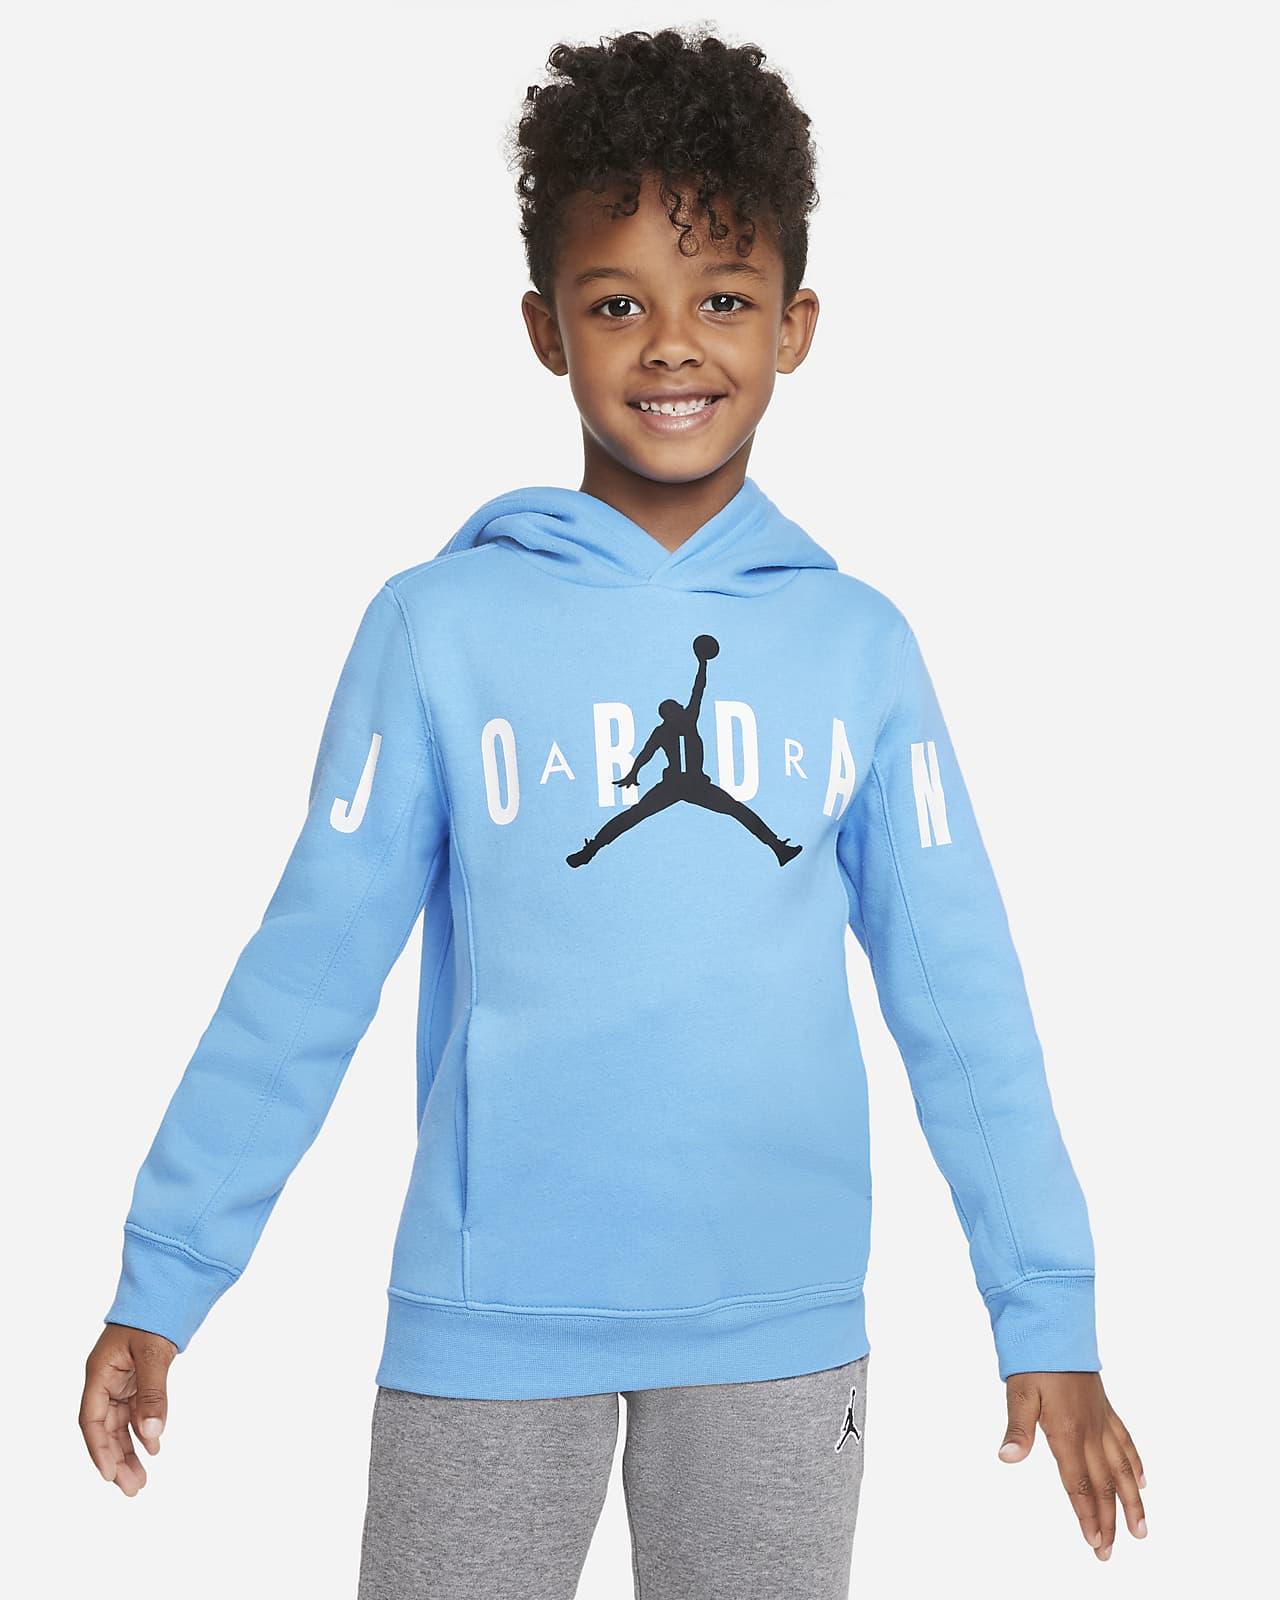 Jordan 幼童套头连帽衫